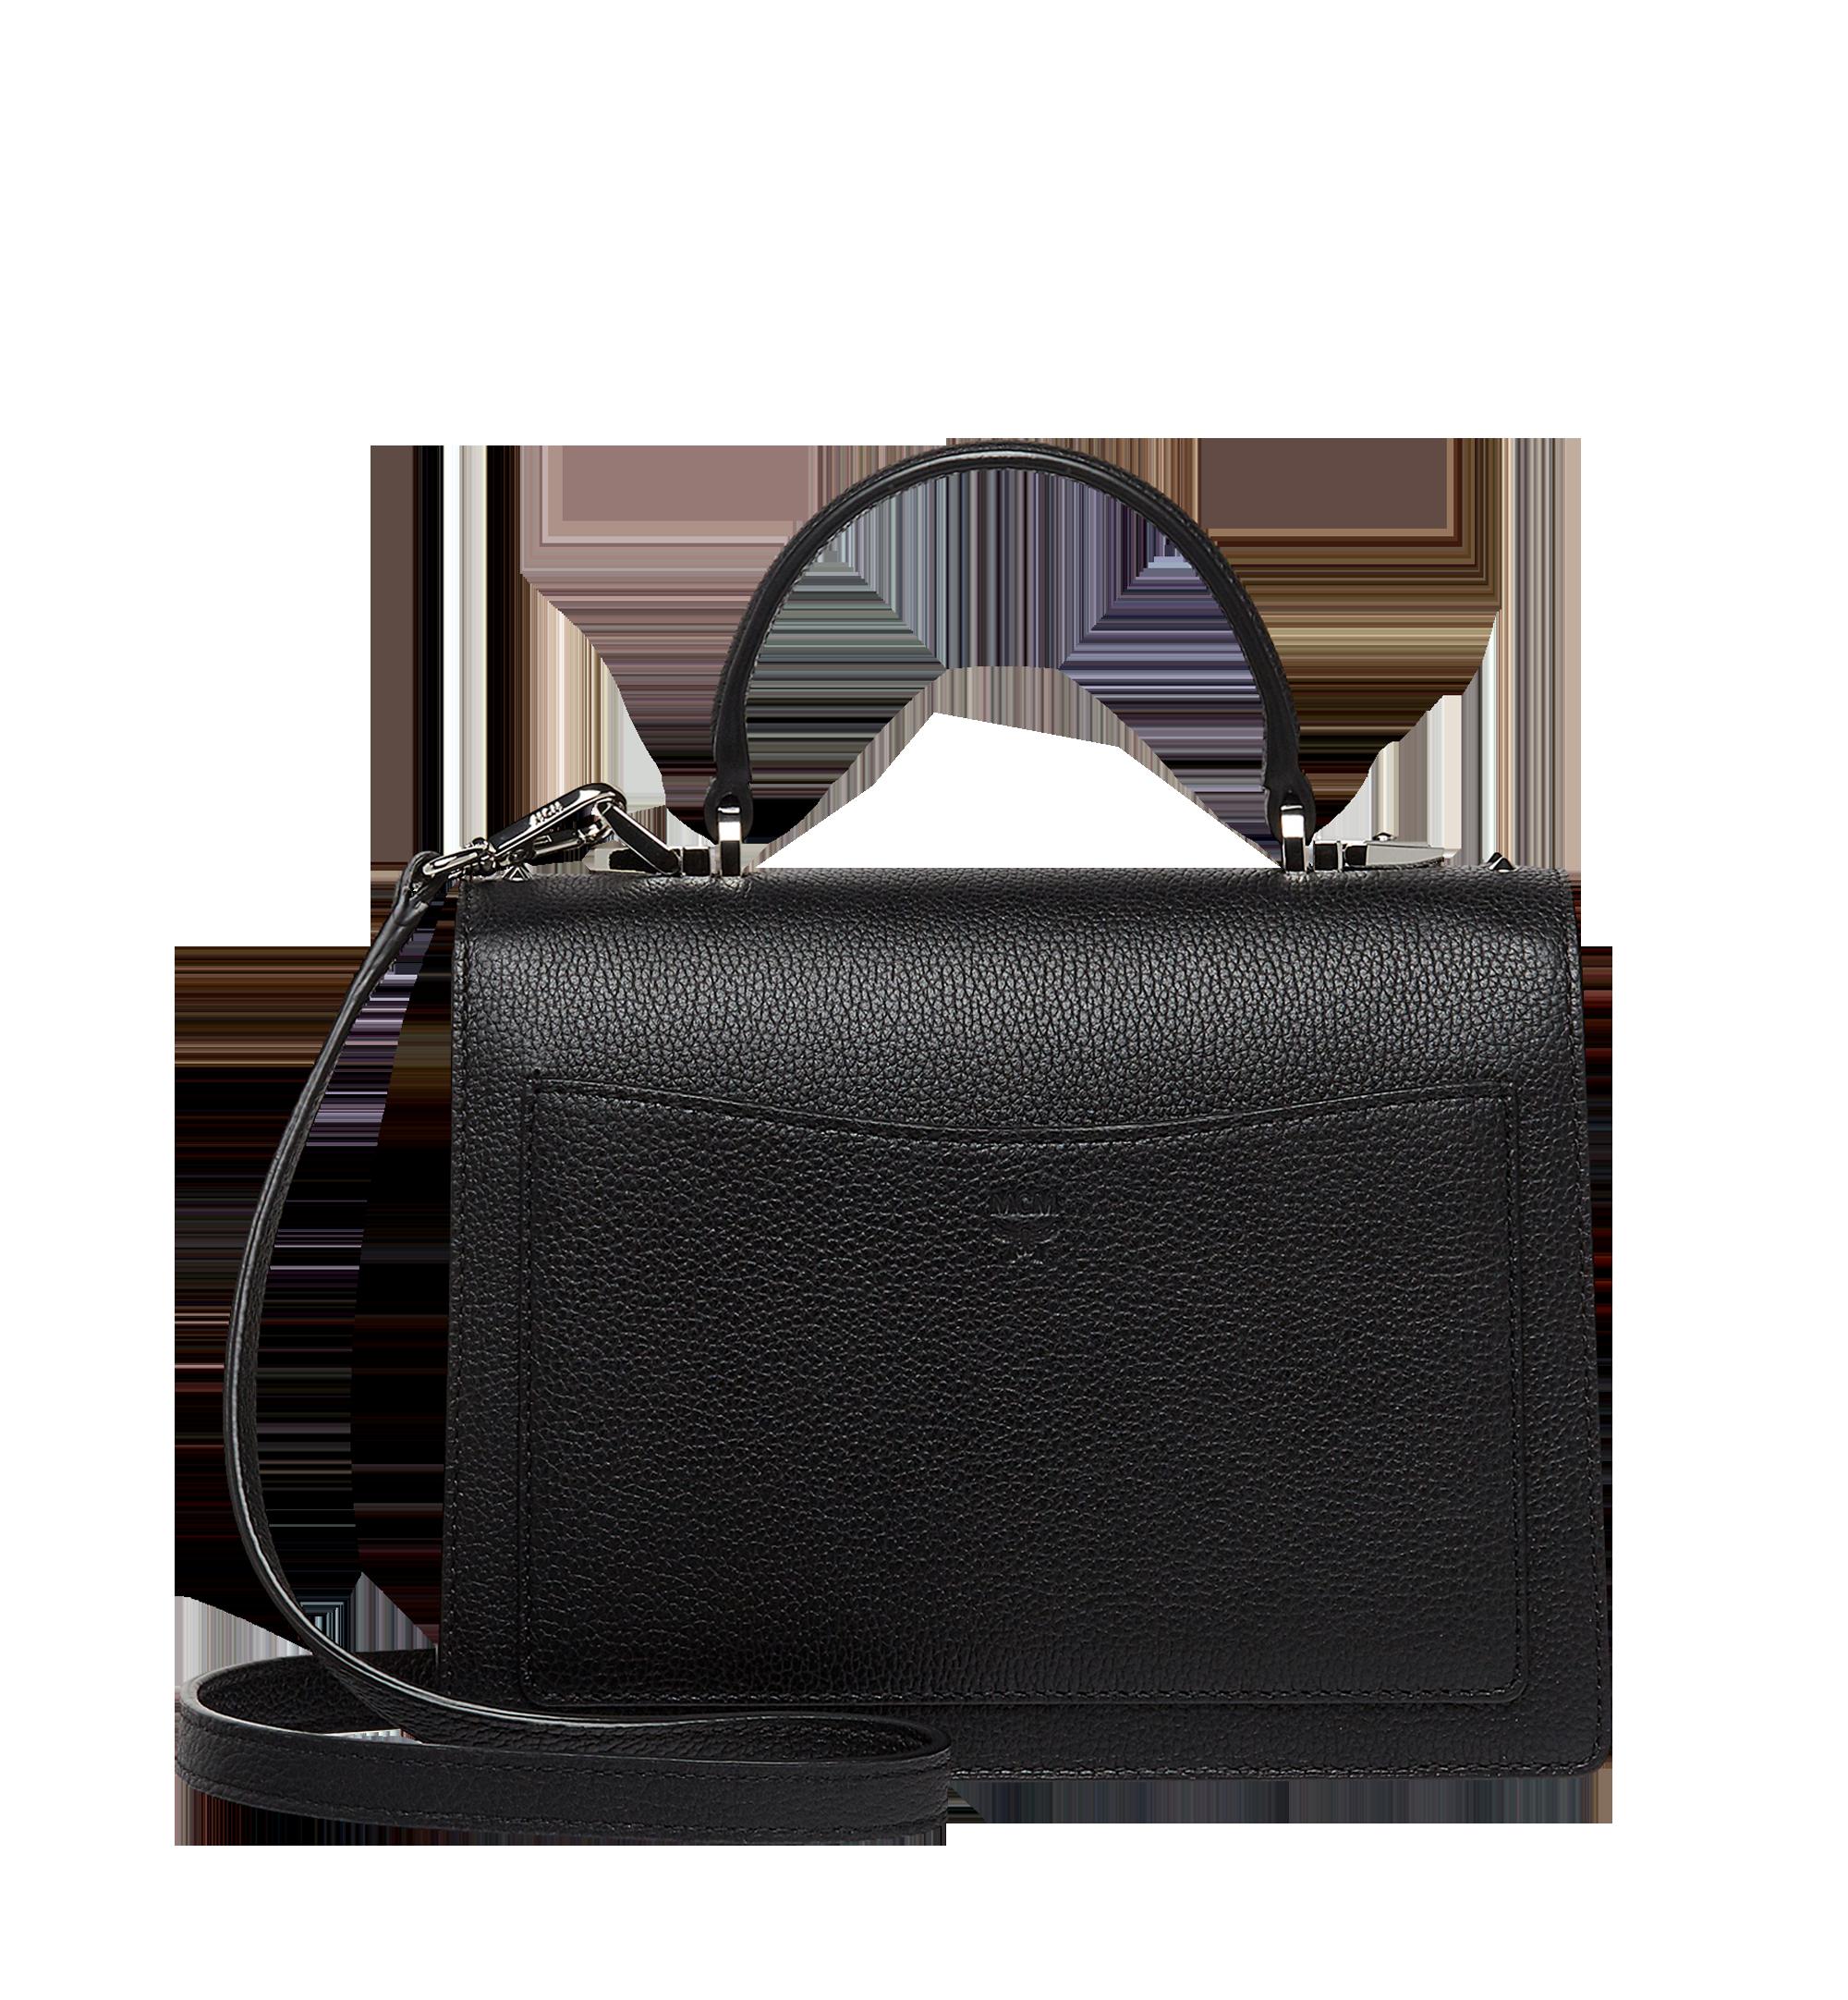 MCM Patricia Satchel in Studded Outline Leather Black MWE8APA51BK001 Alternate View 4